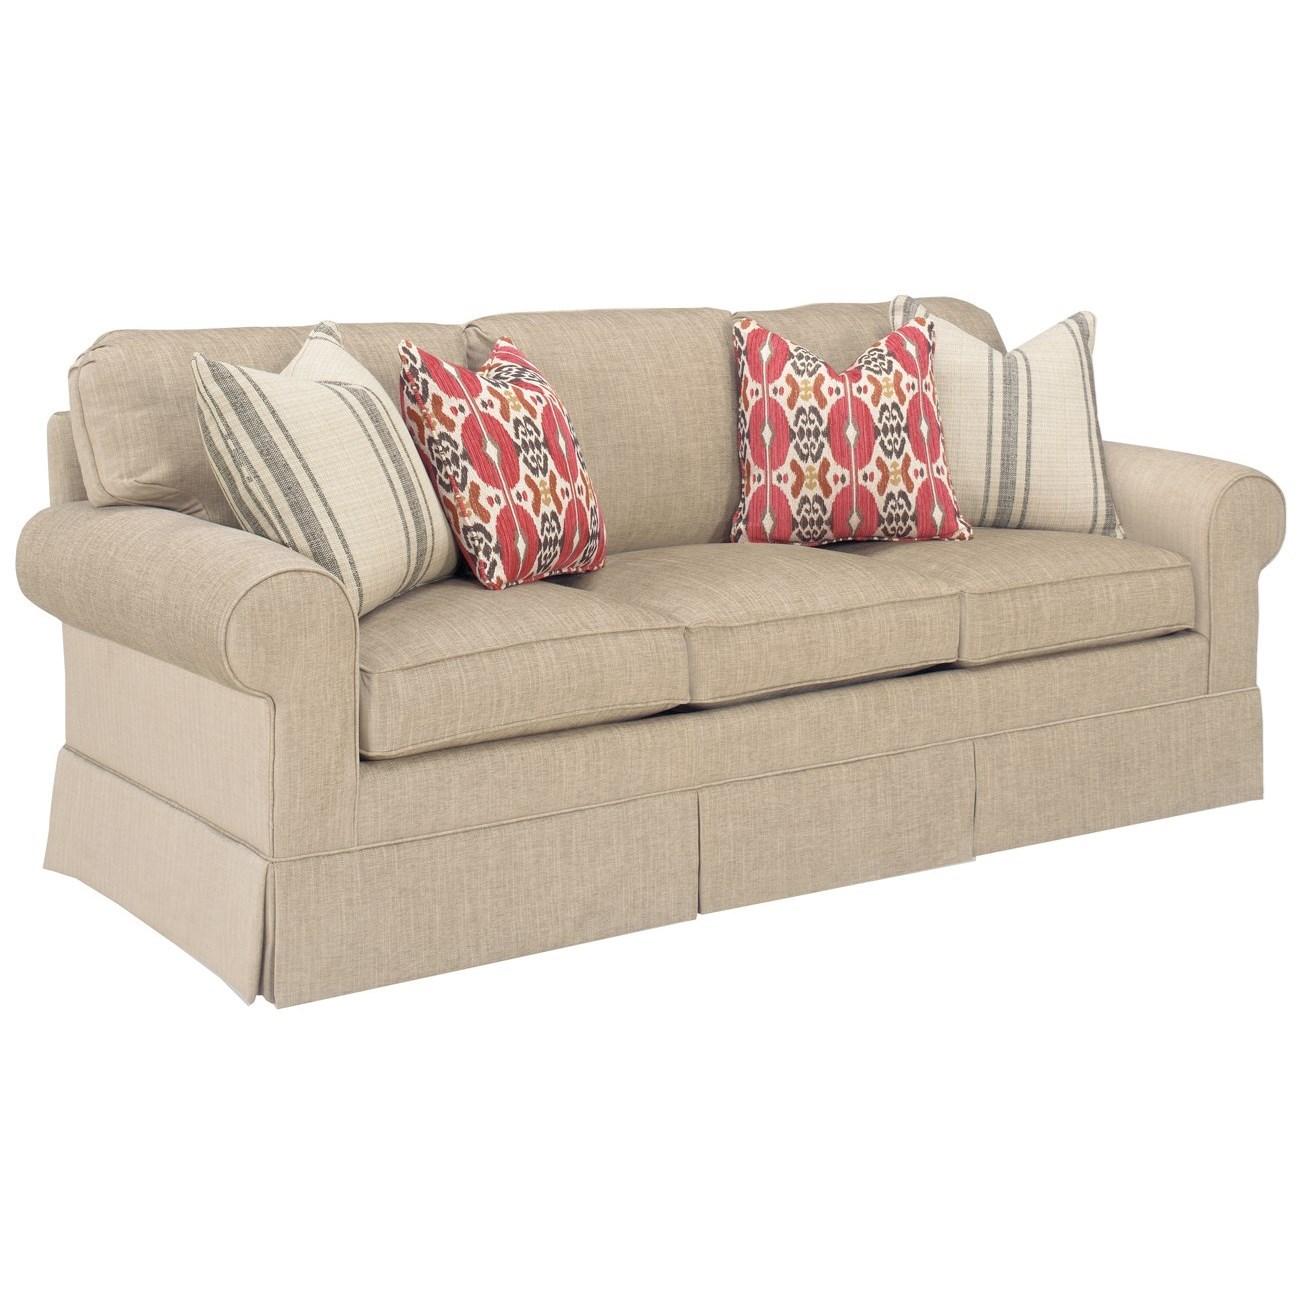 Personal Design Series Bedford Customizable Sleeper Sofa by Lexington at Johnny Janosik